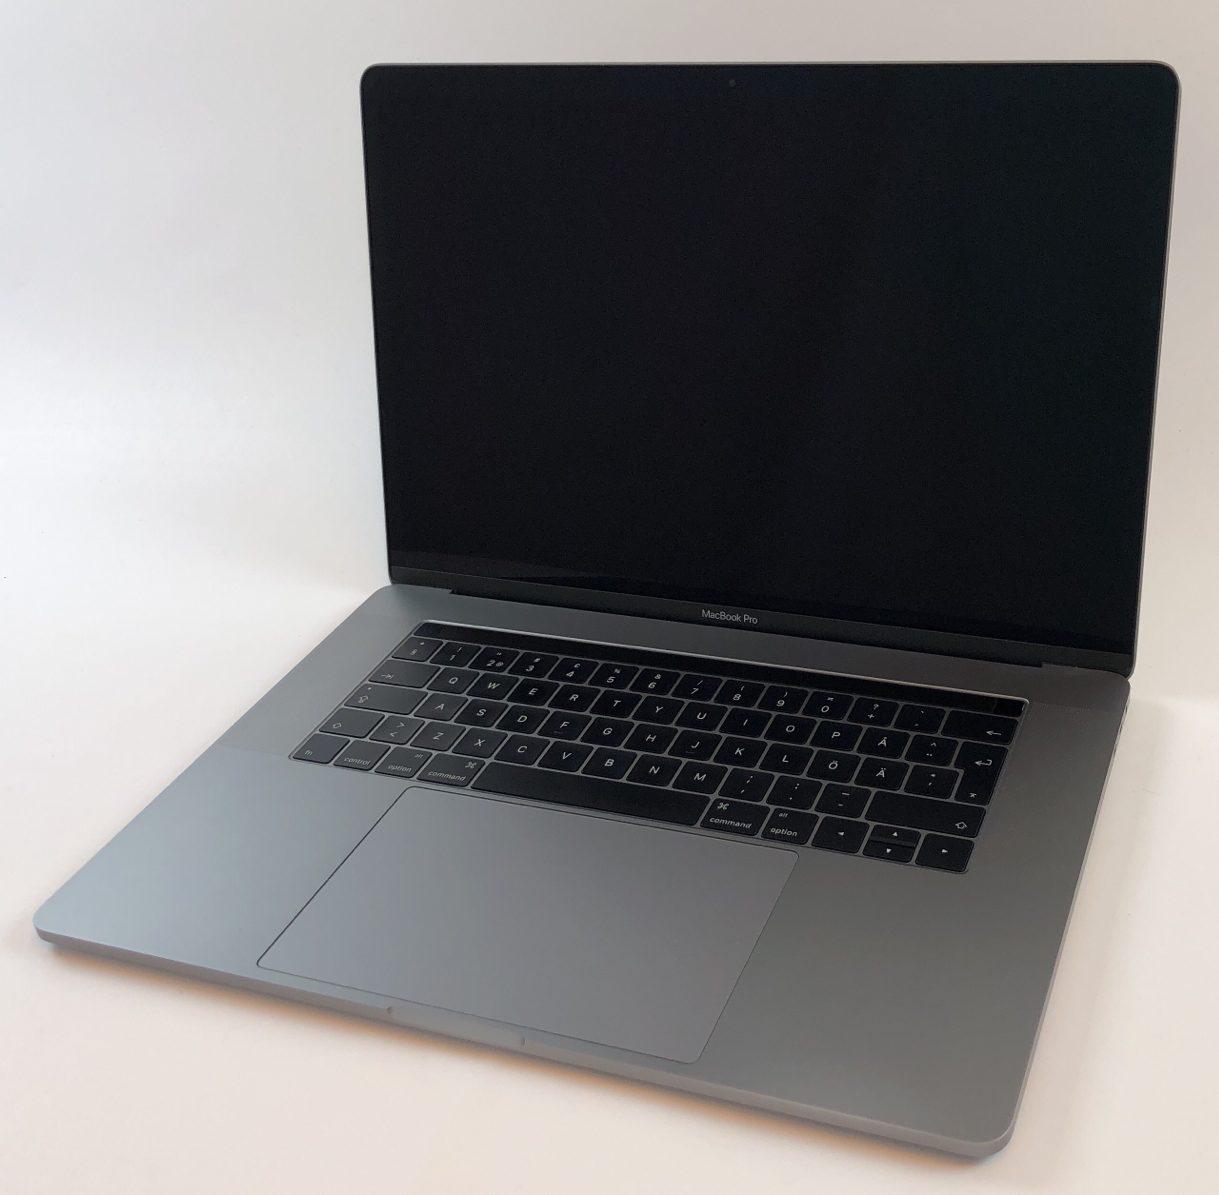 "MacBook Pro 15"" Touch Bar Late 2016 (Intel Quad-Core i7 2.7 GHz 16 GB RAM 512 GB SSD), Space Gray, Intel Quad-Core i7 2.7 GHz, 16 GB RAM, 512 GB SSD, Kuva 1"